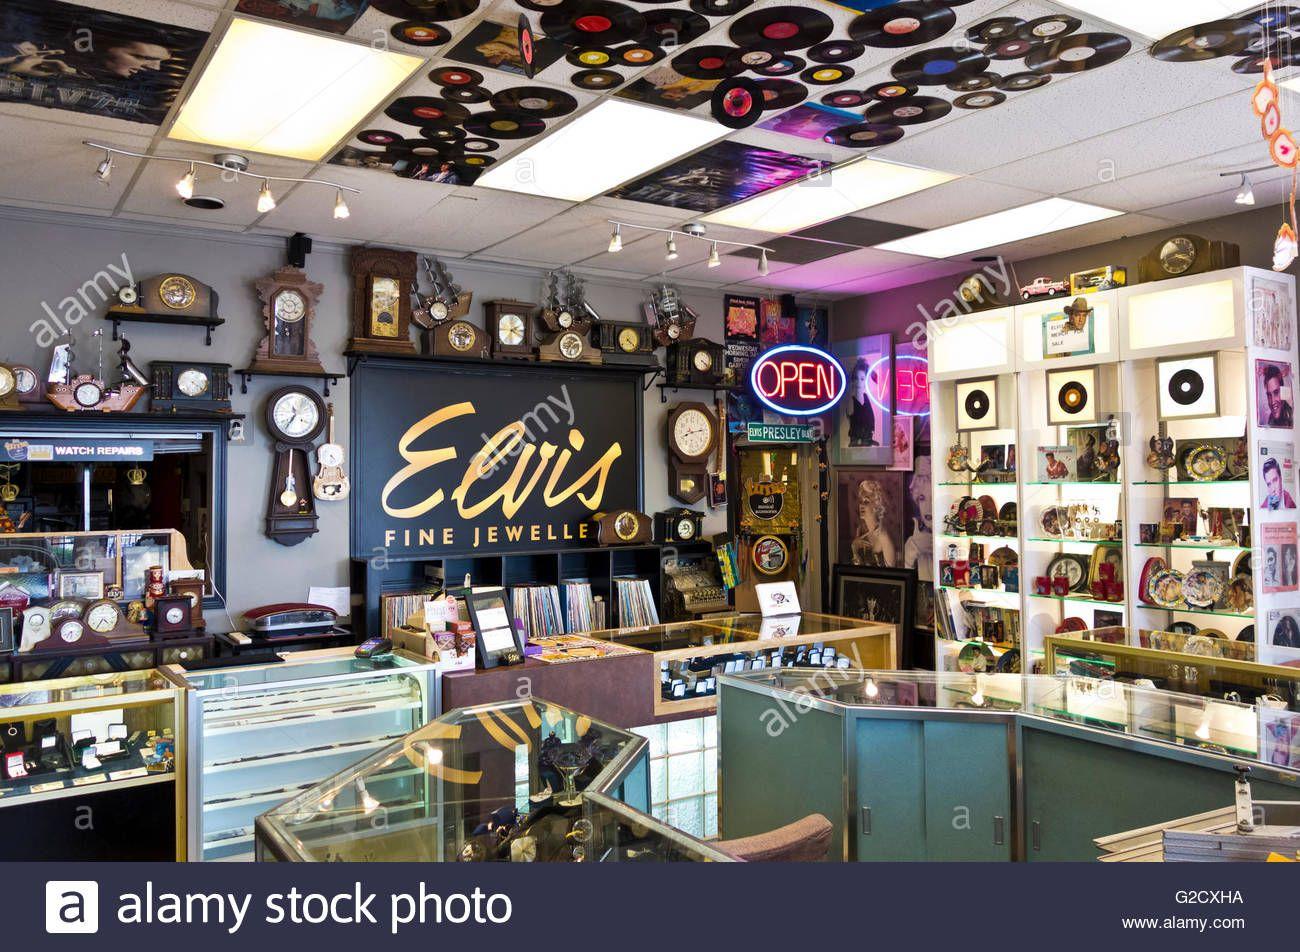 22++ Jewelry store on elvis presley viral